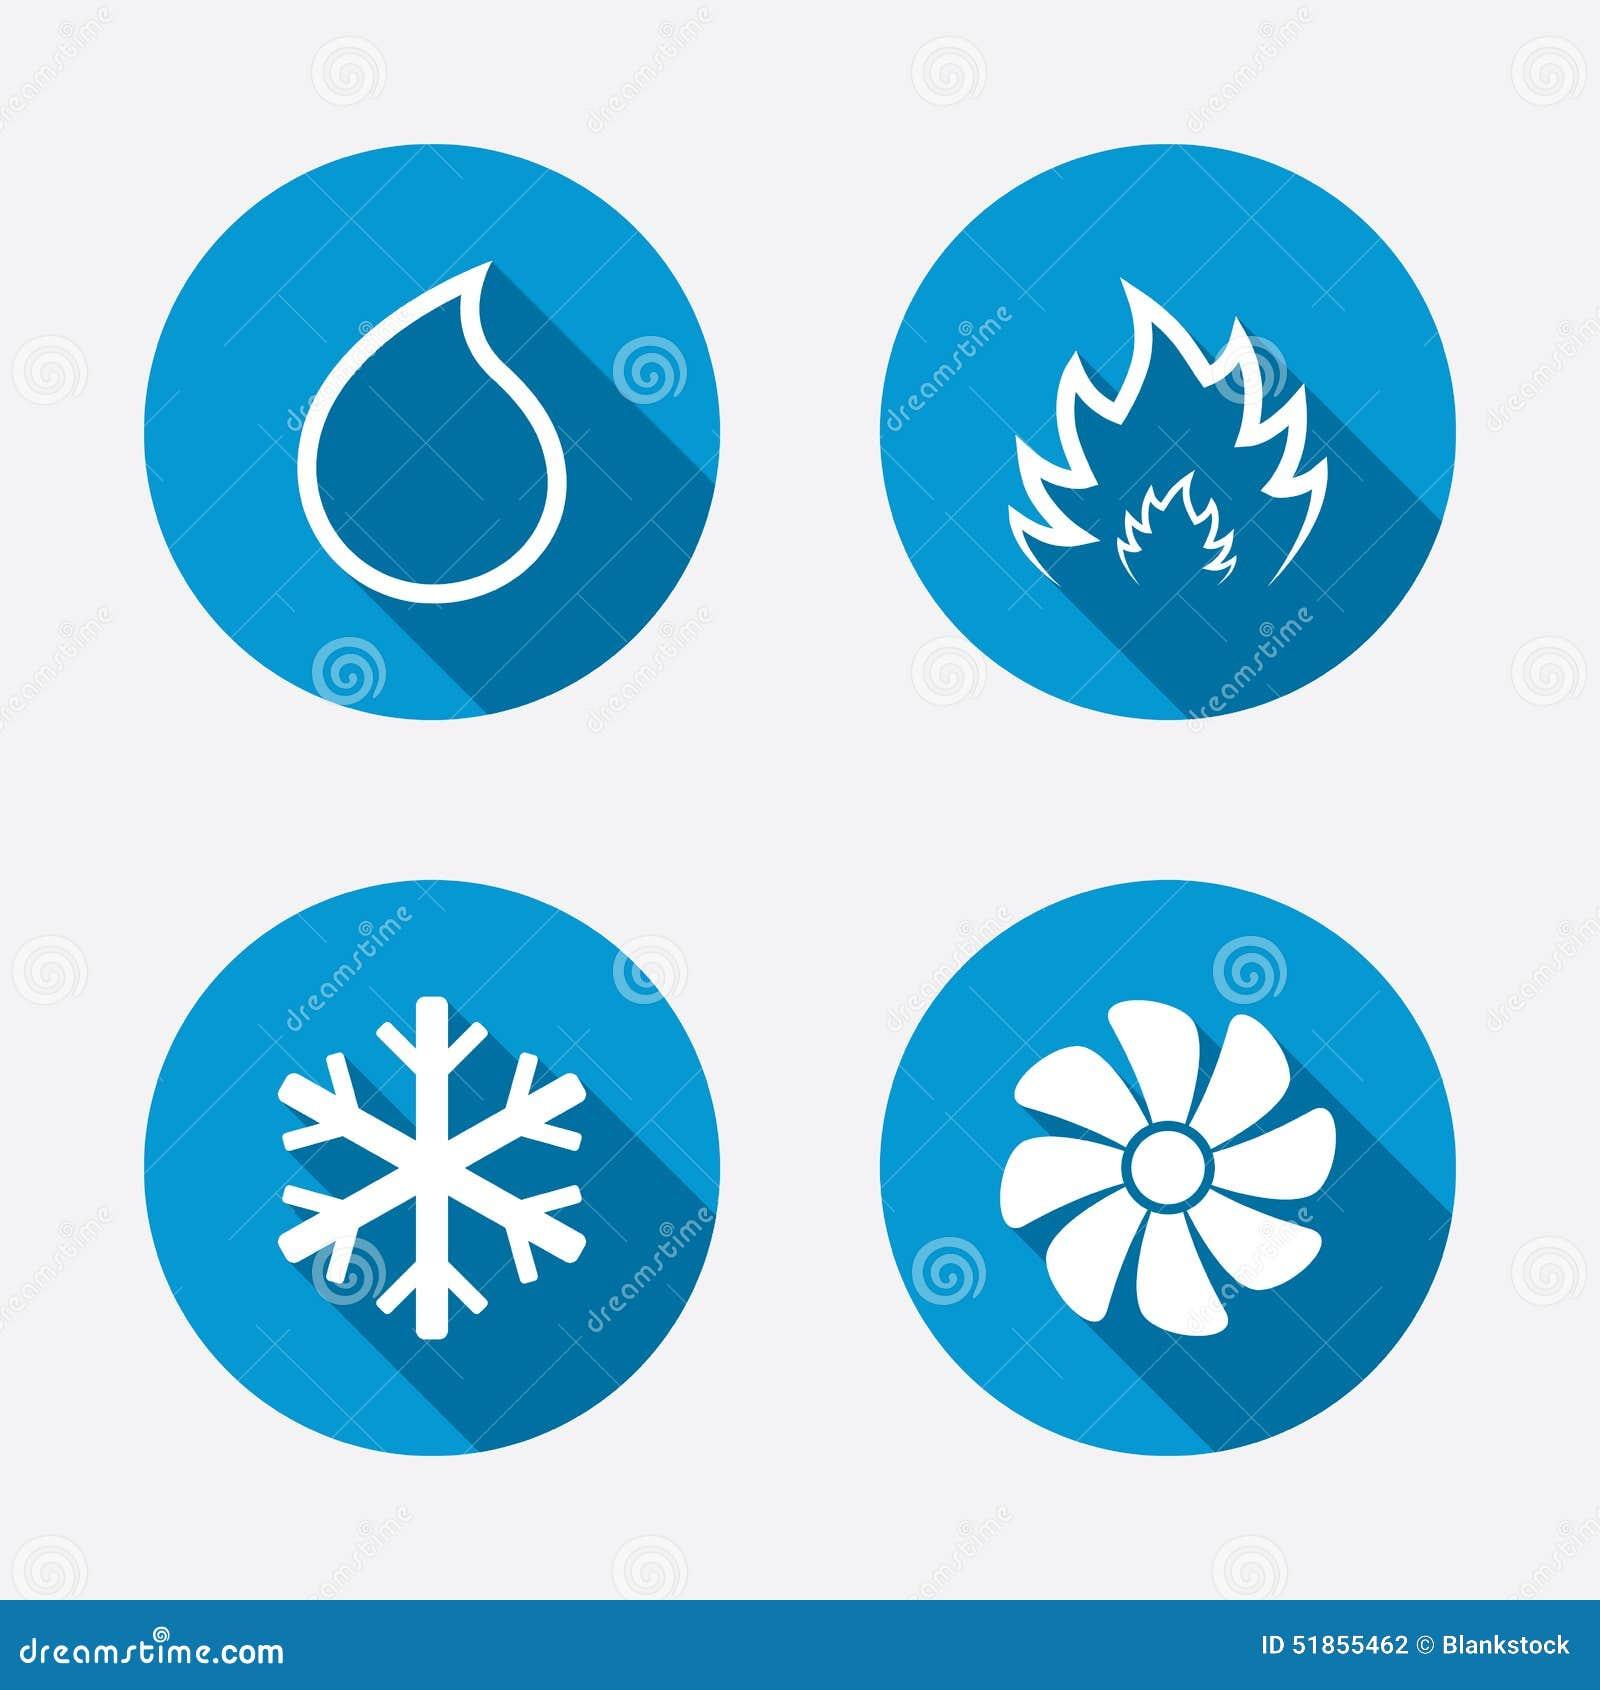 Hvac Riscaldamento Arieggiando E Condizionamento D Aria